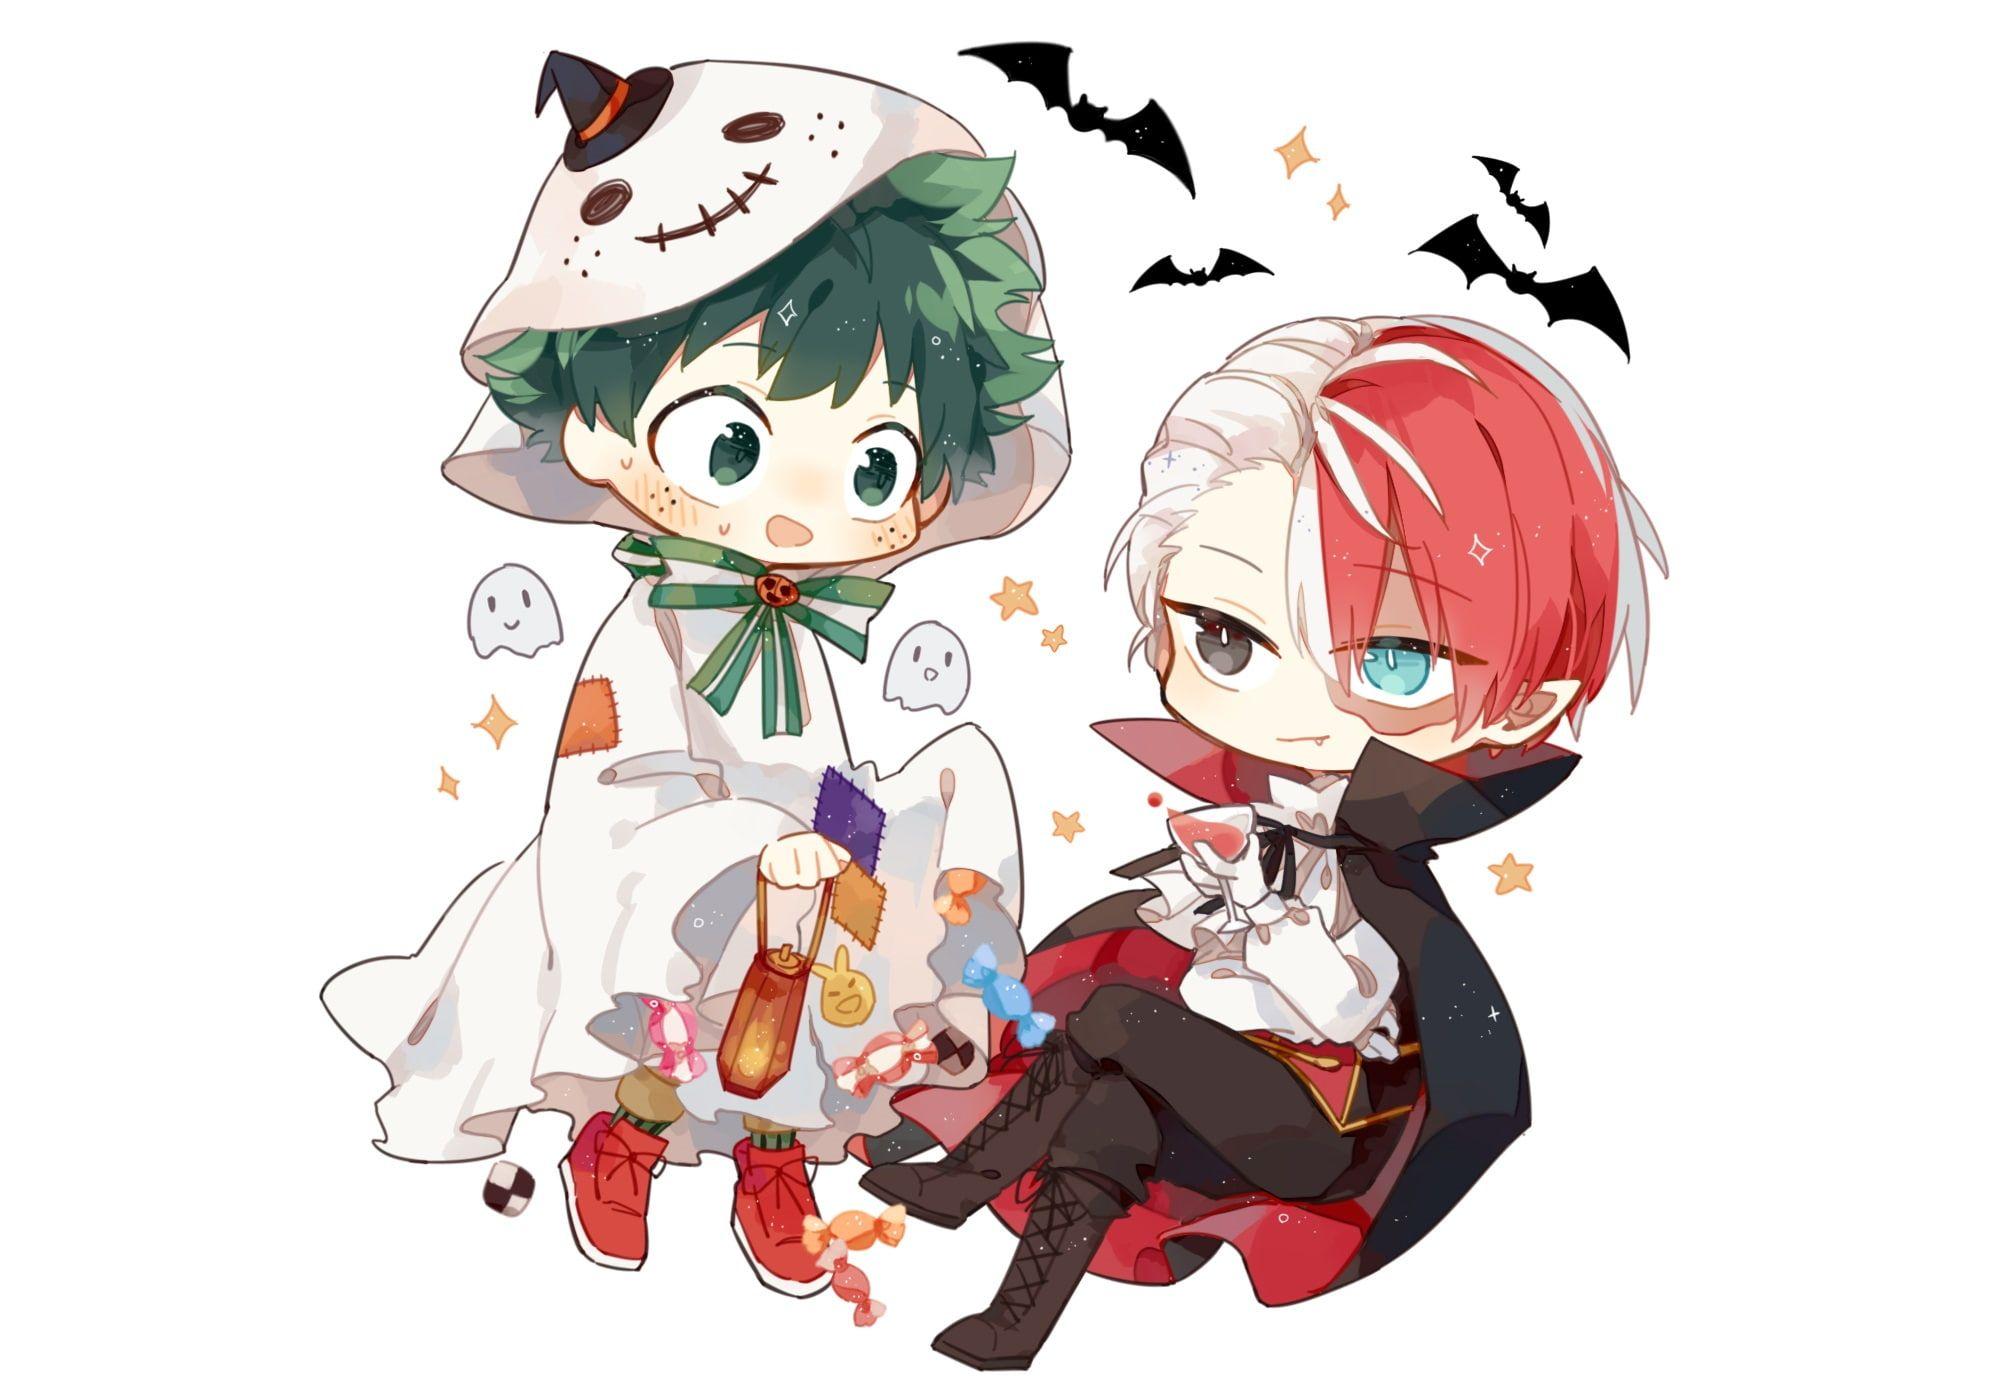 Anime My Hero Academia Halloween Izuku Midoriya Shouto Todoroki 1080p Wallpaper Hdwallpaper Desktop Anime Wallpaper Anime My Hero